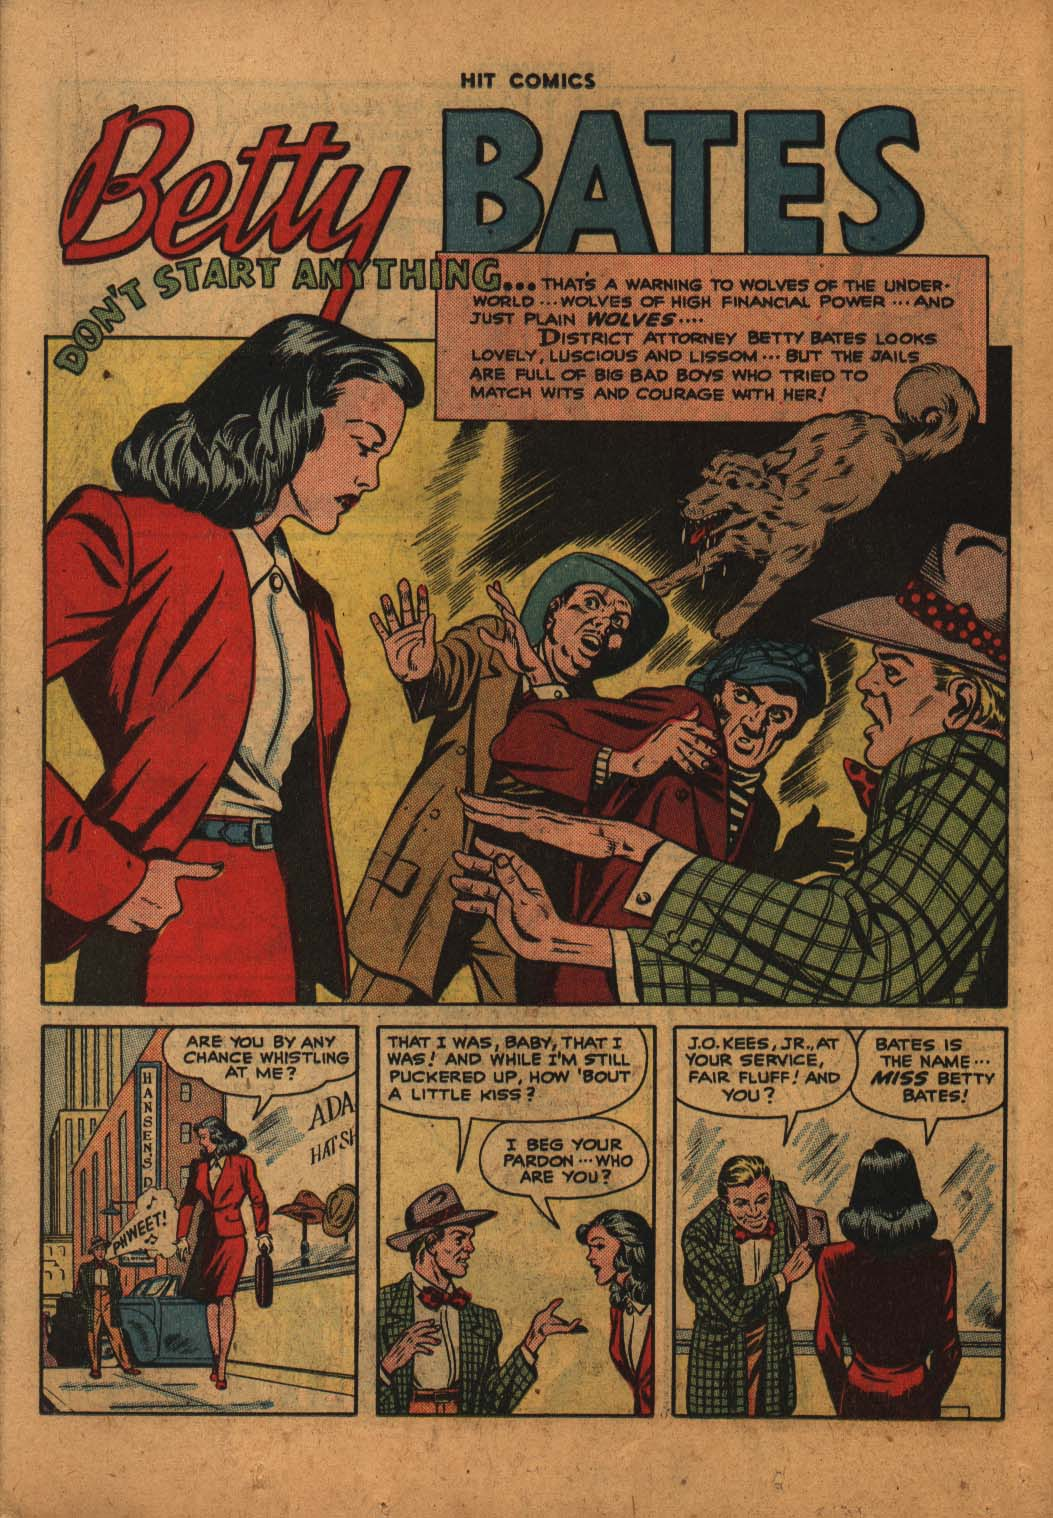 Read online Hit Comics comic -  Issue #47 - 25